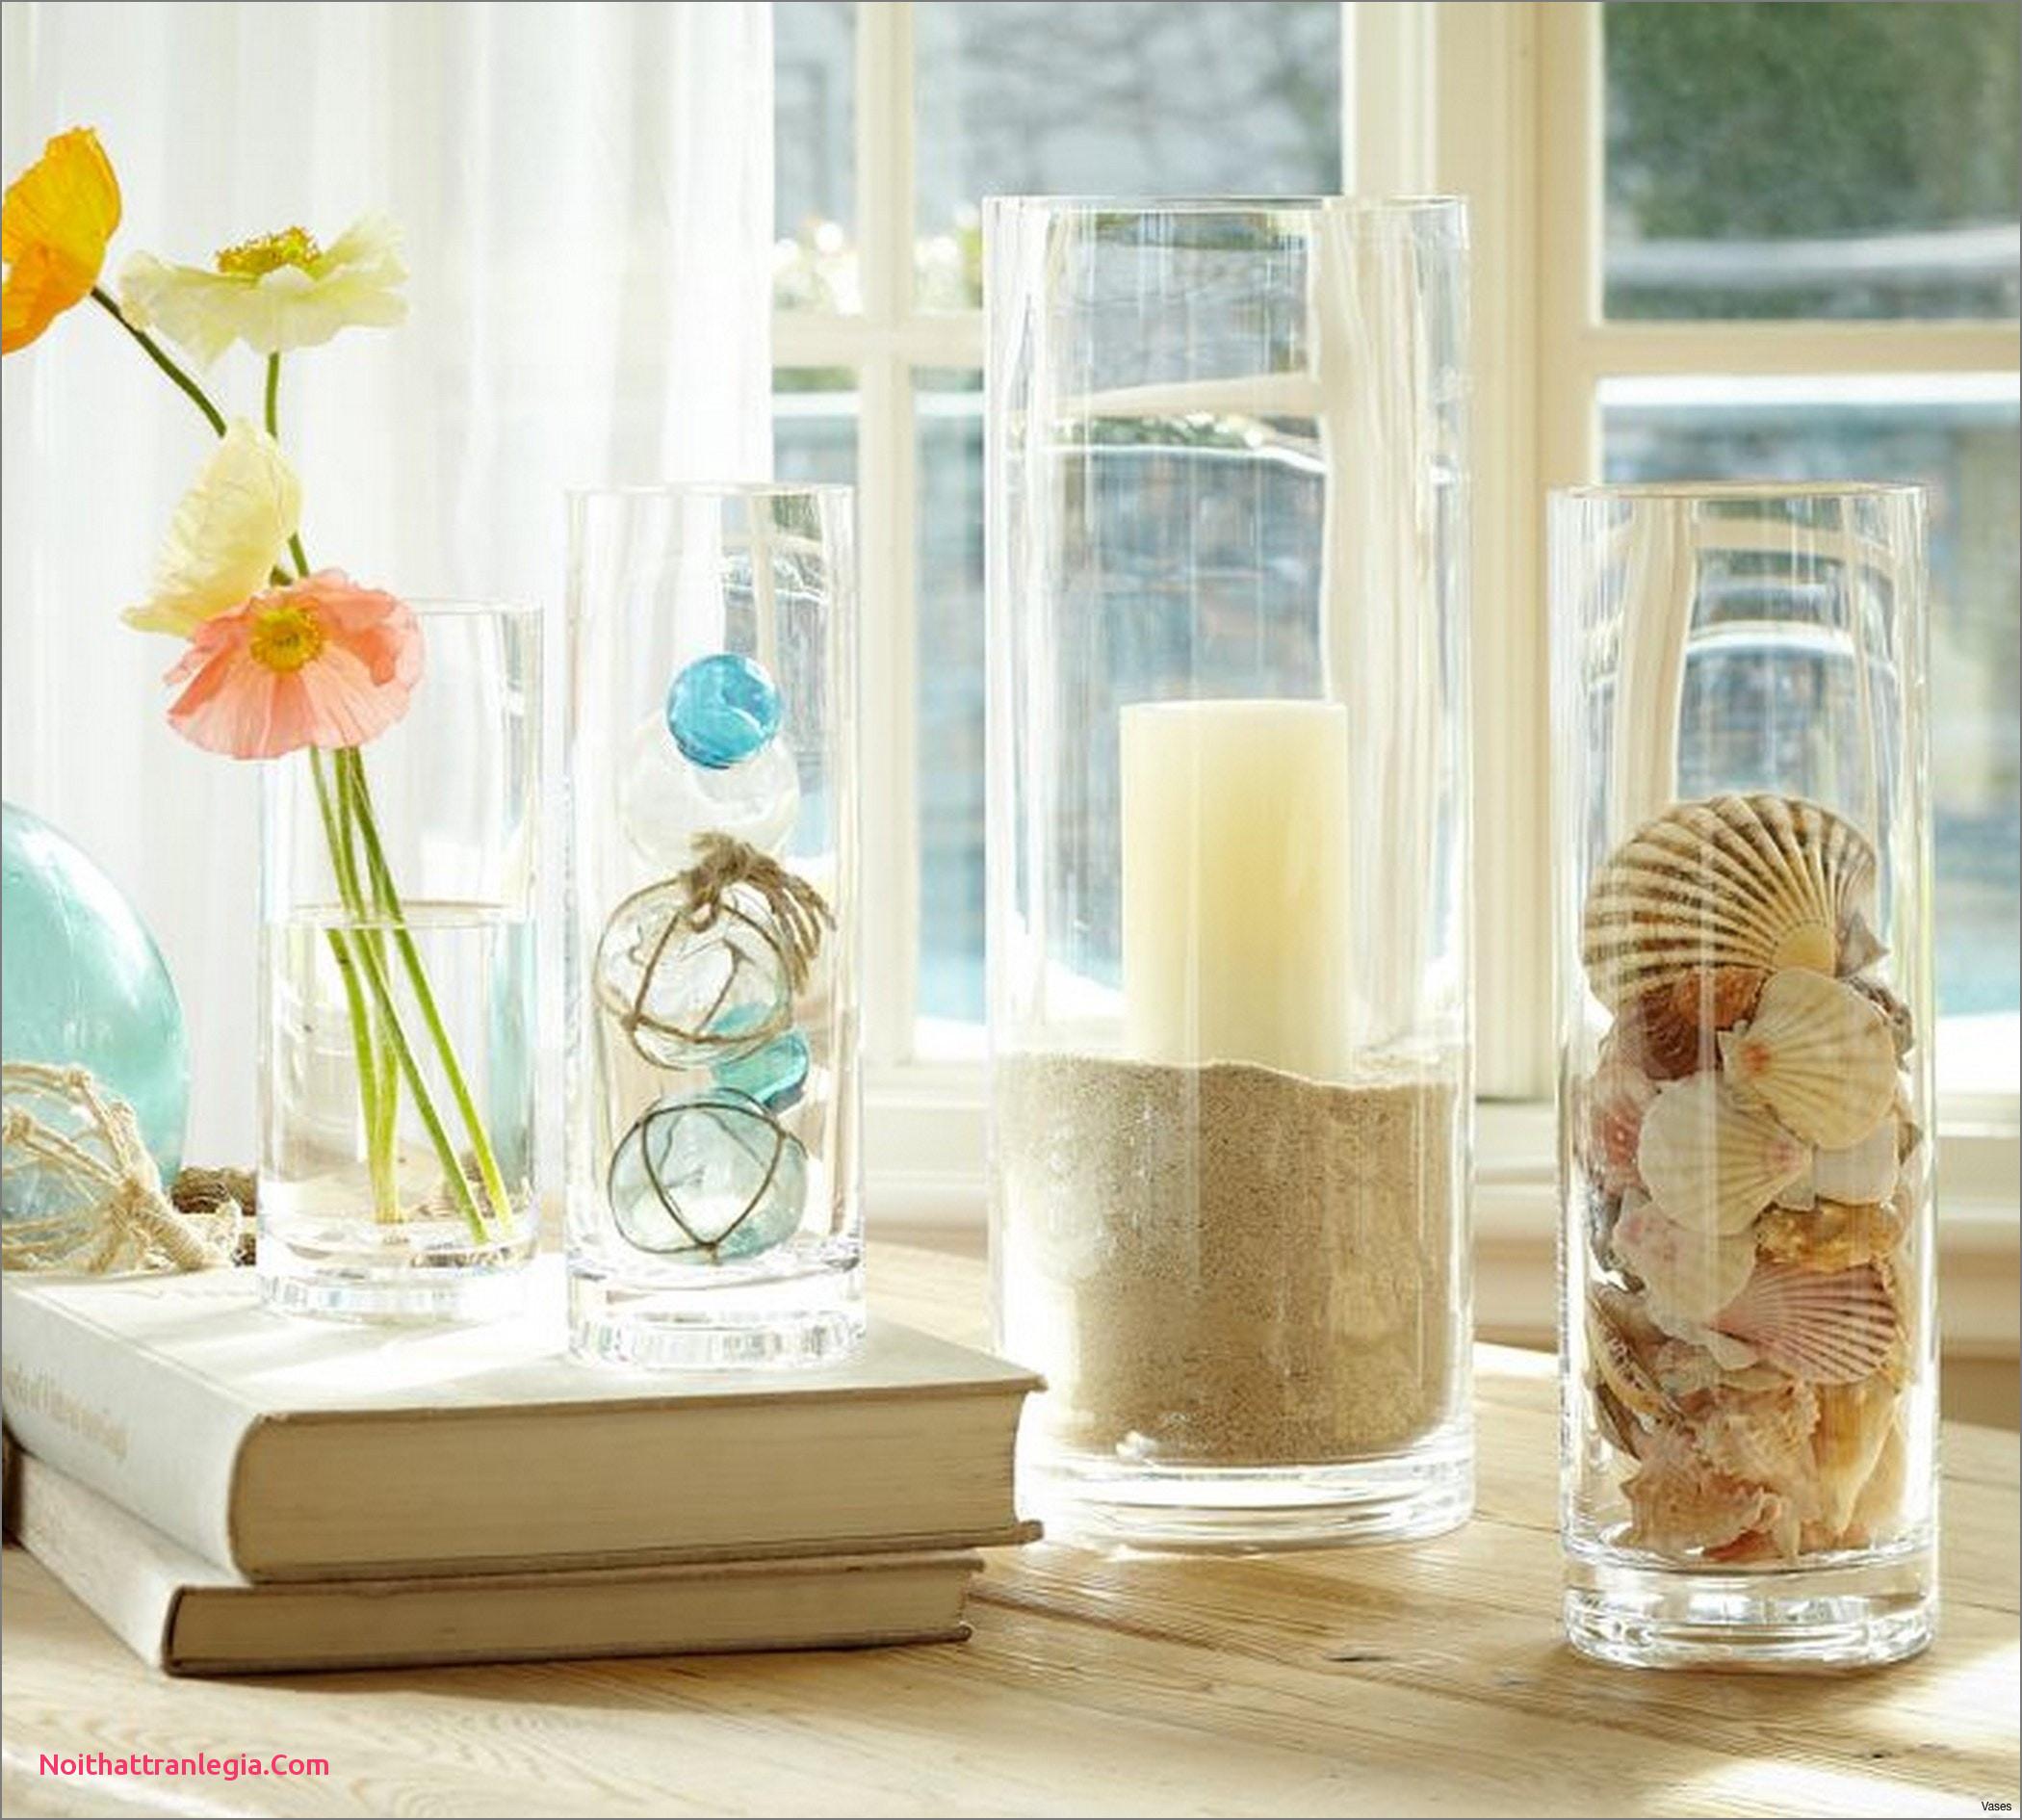 vase with hole for lights of 20 how to make mercury glass vases noithattranlegia vases design regarding glass vase fillers vase filler ideas 5h vases summer 5i 0d inspiration vase